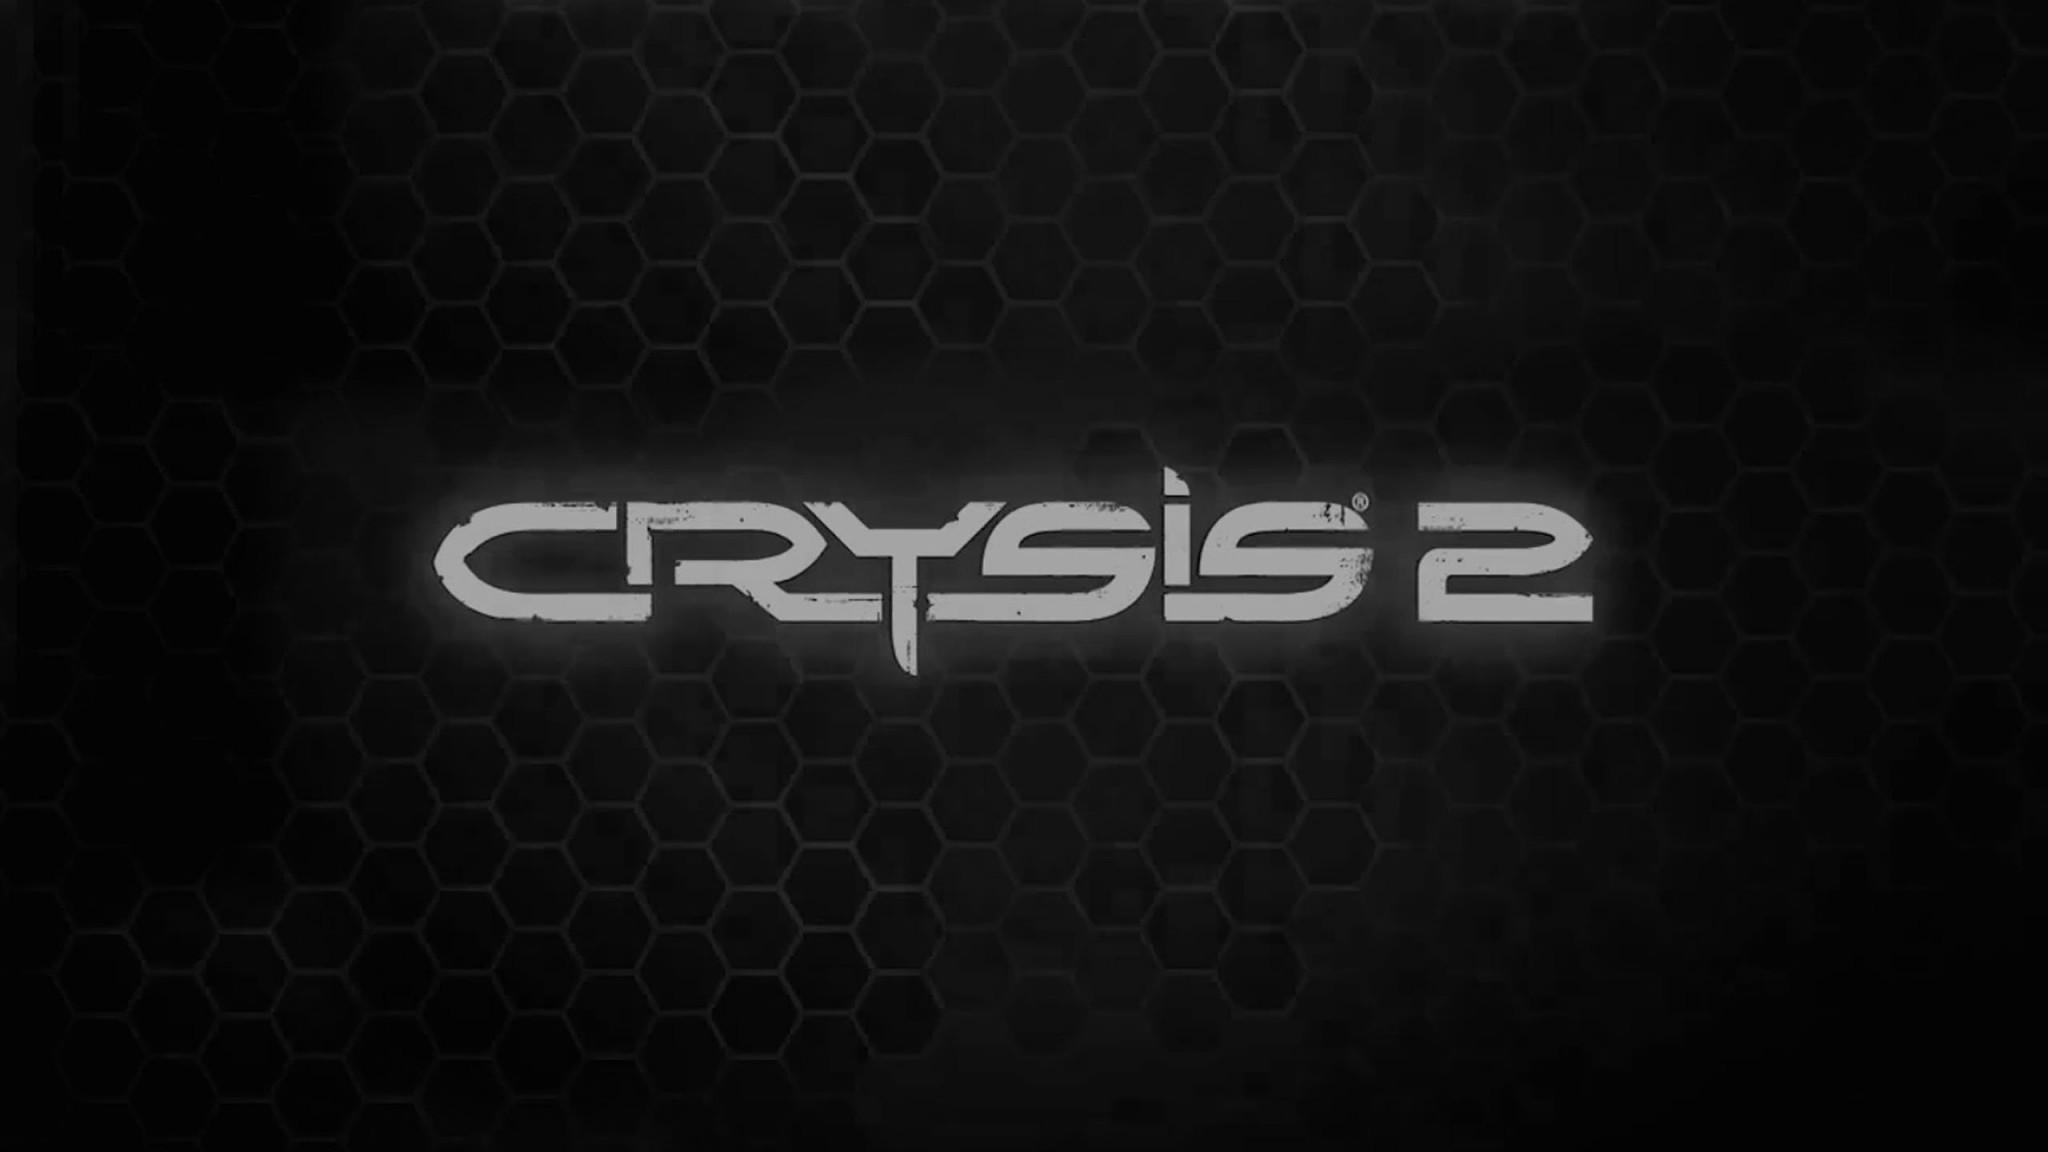 Wallpaper crysis 2, name, game, font, background